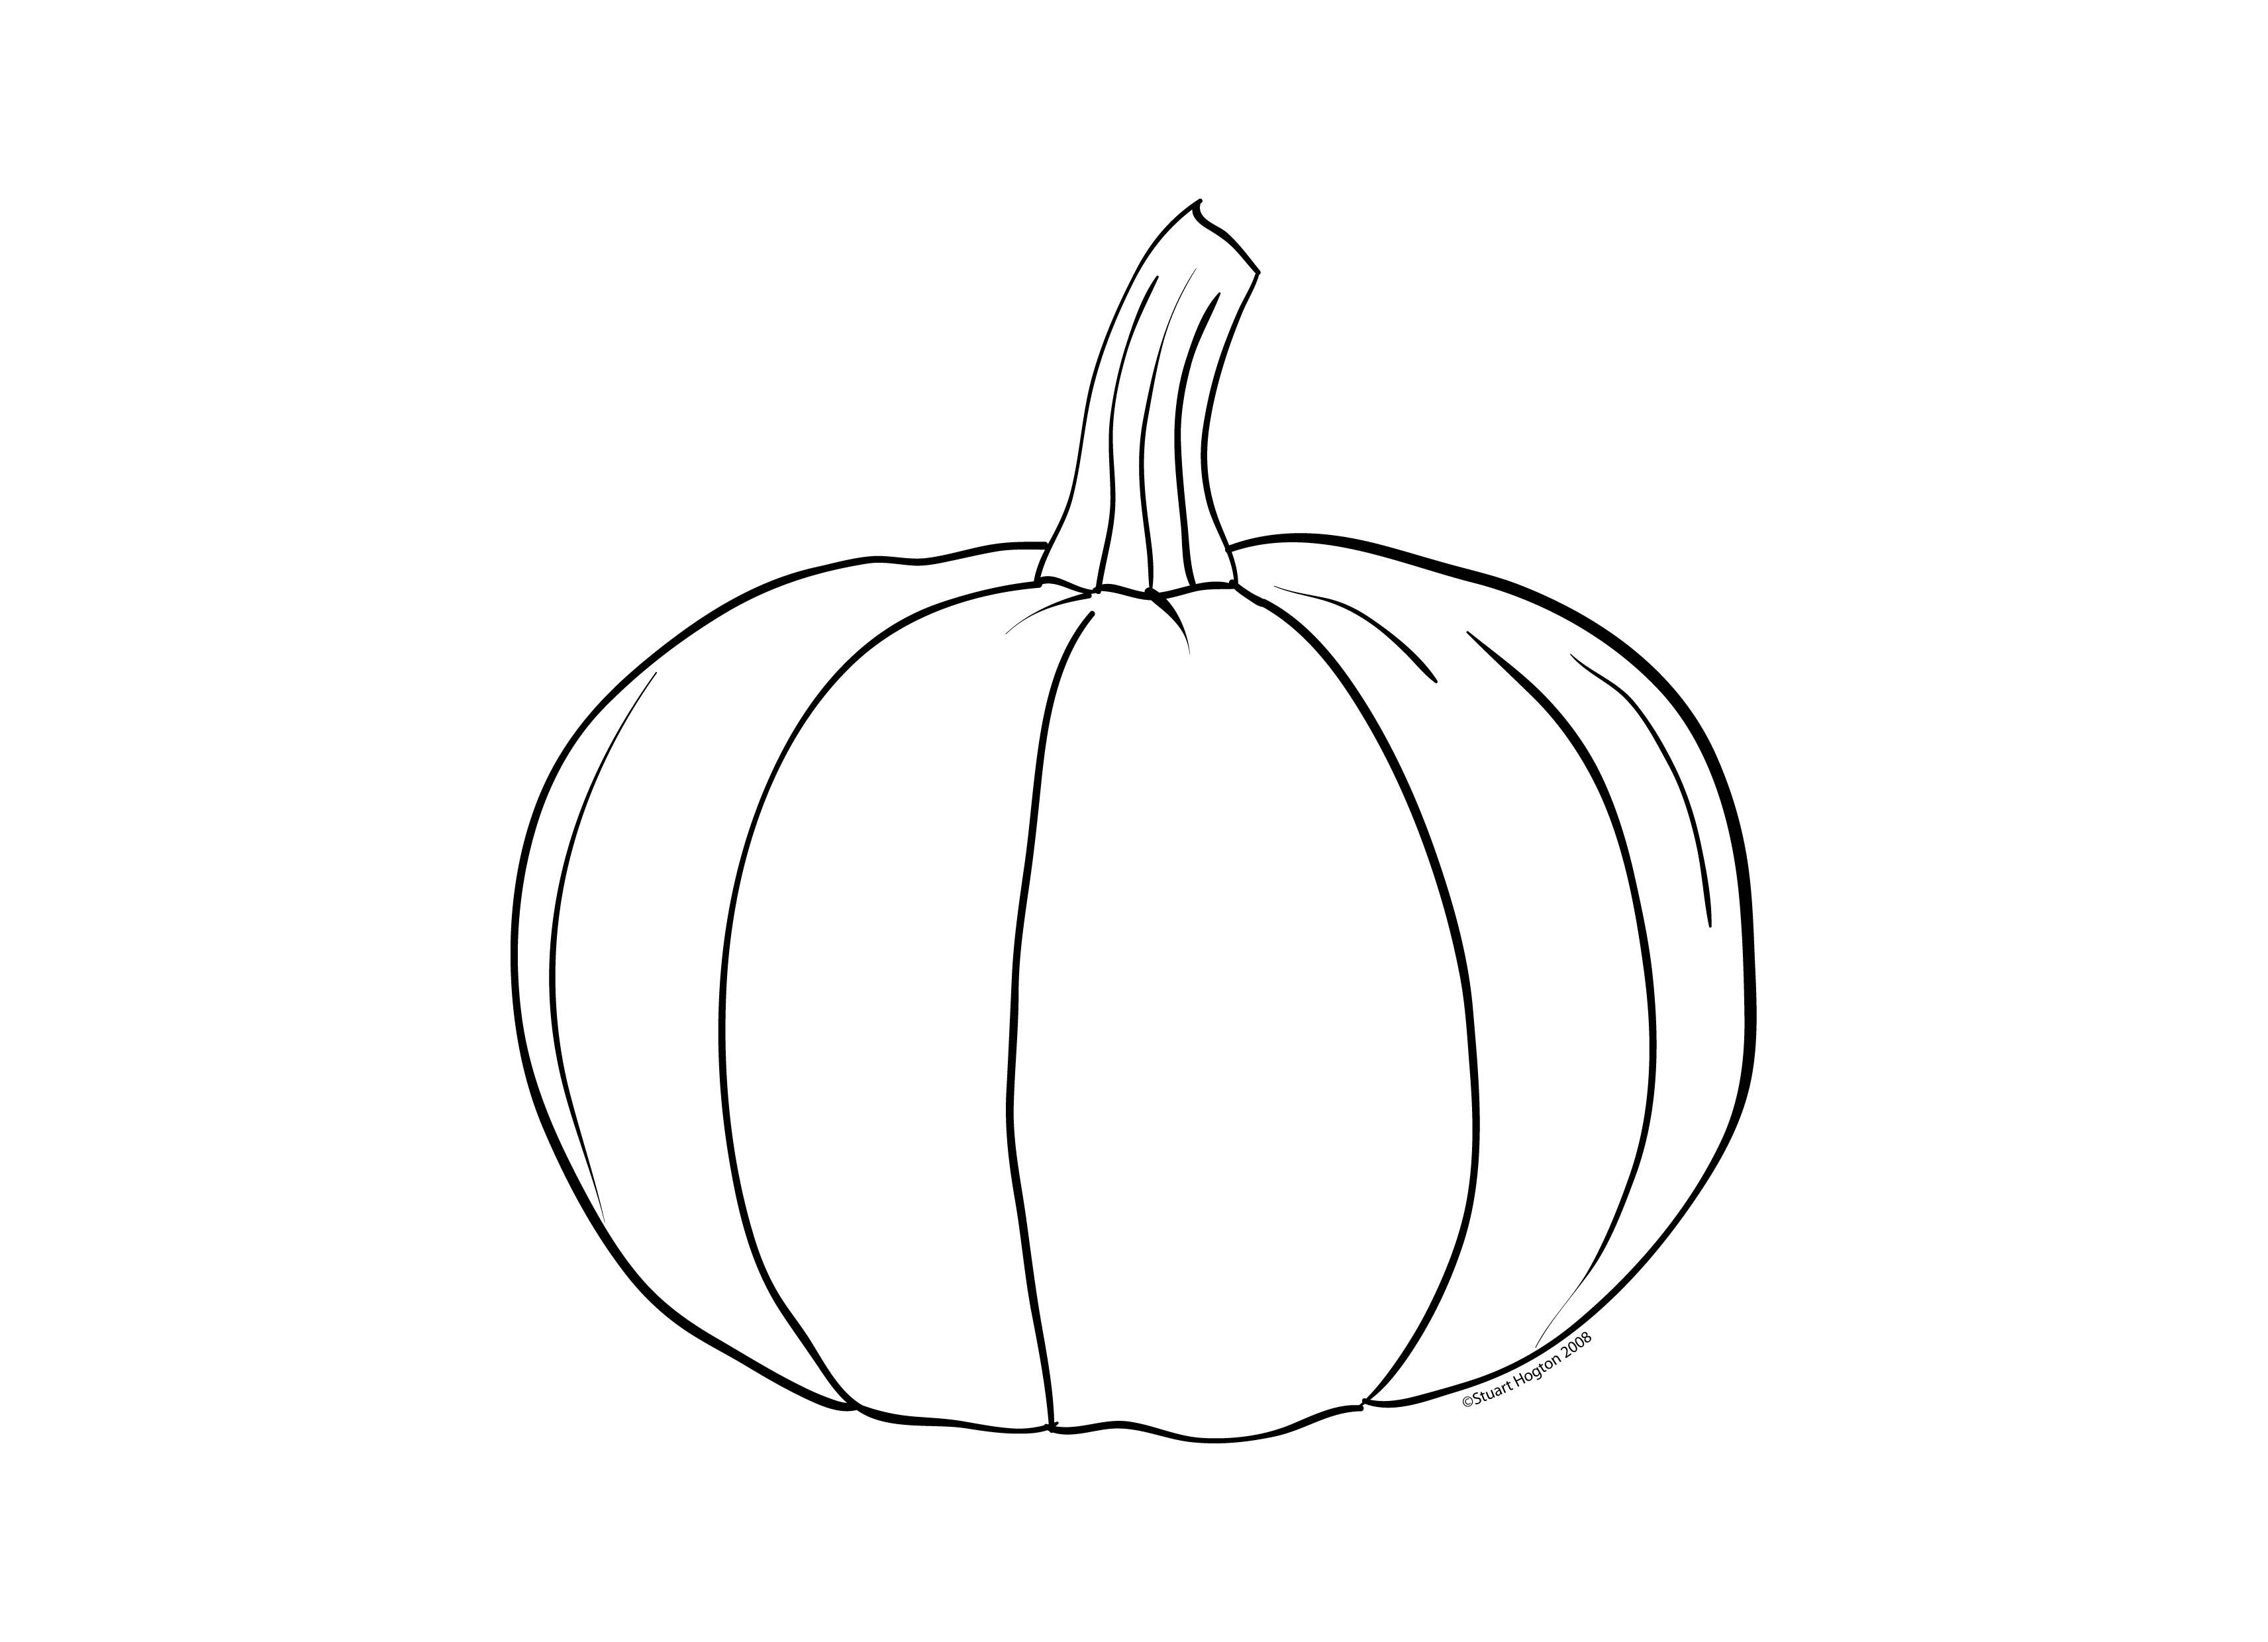 pumpkin cloring pages 2017 z31 coloring page